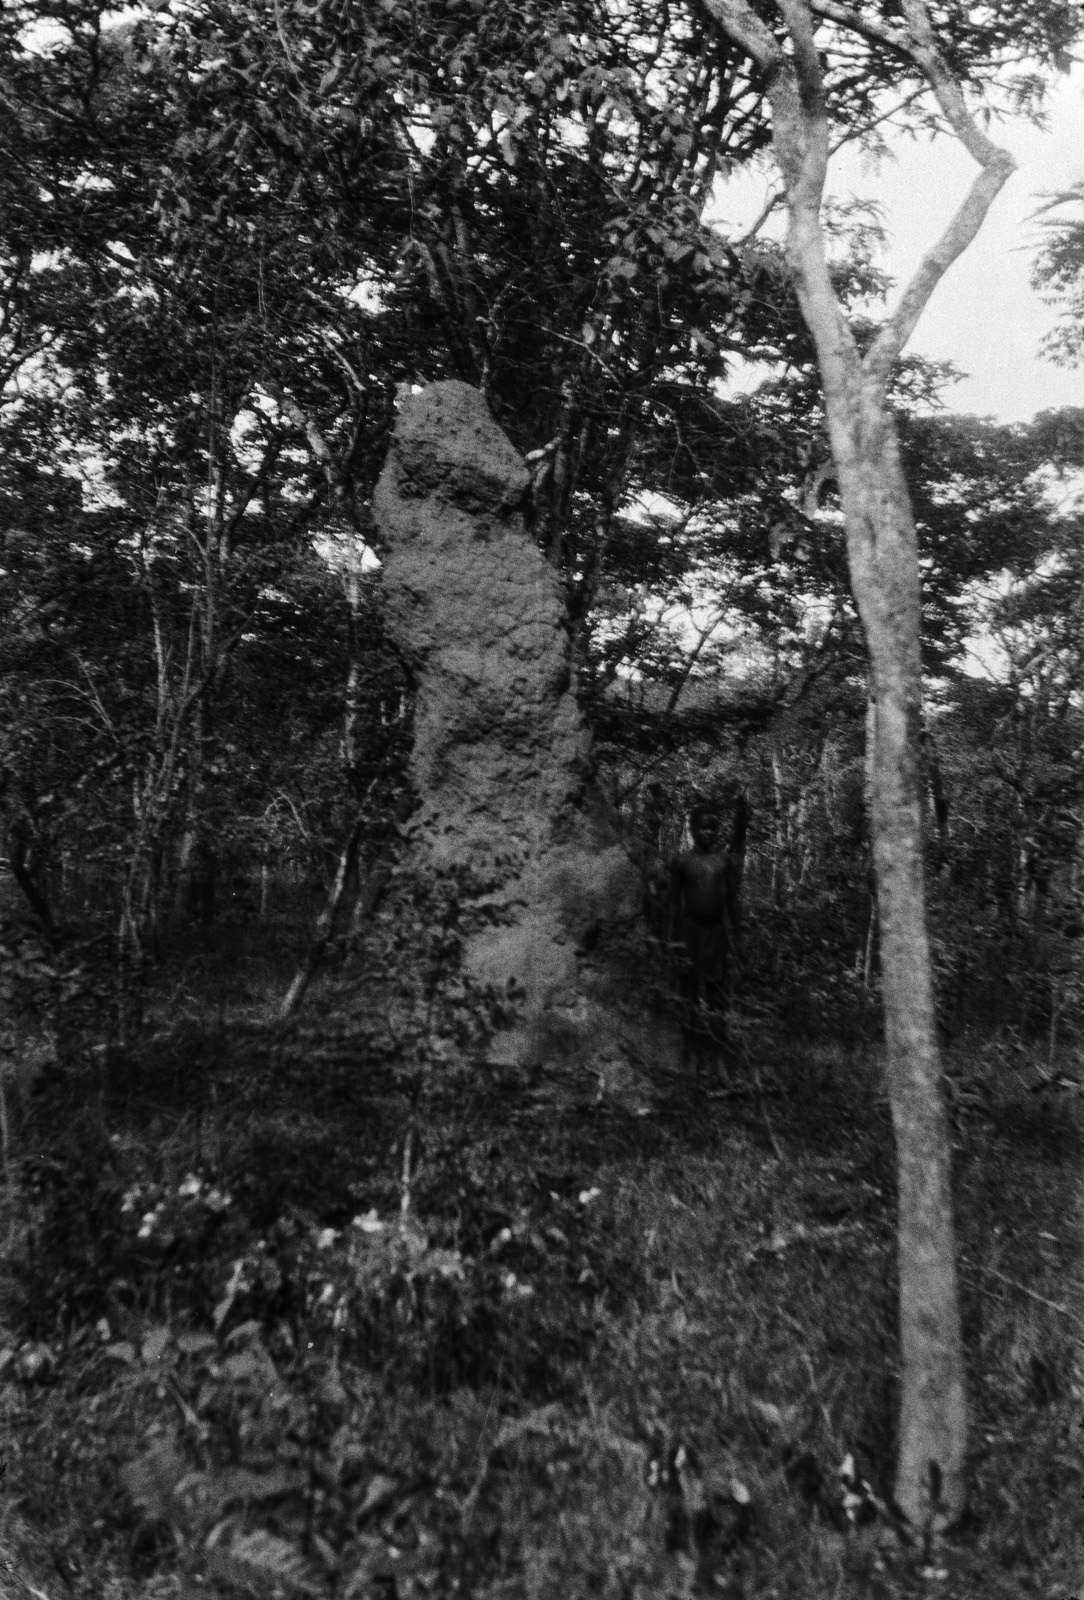 Н'Чанга. Термитник в лесу